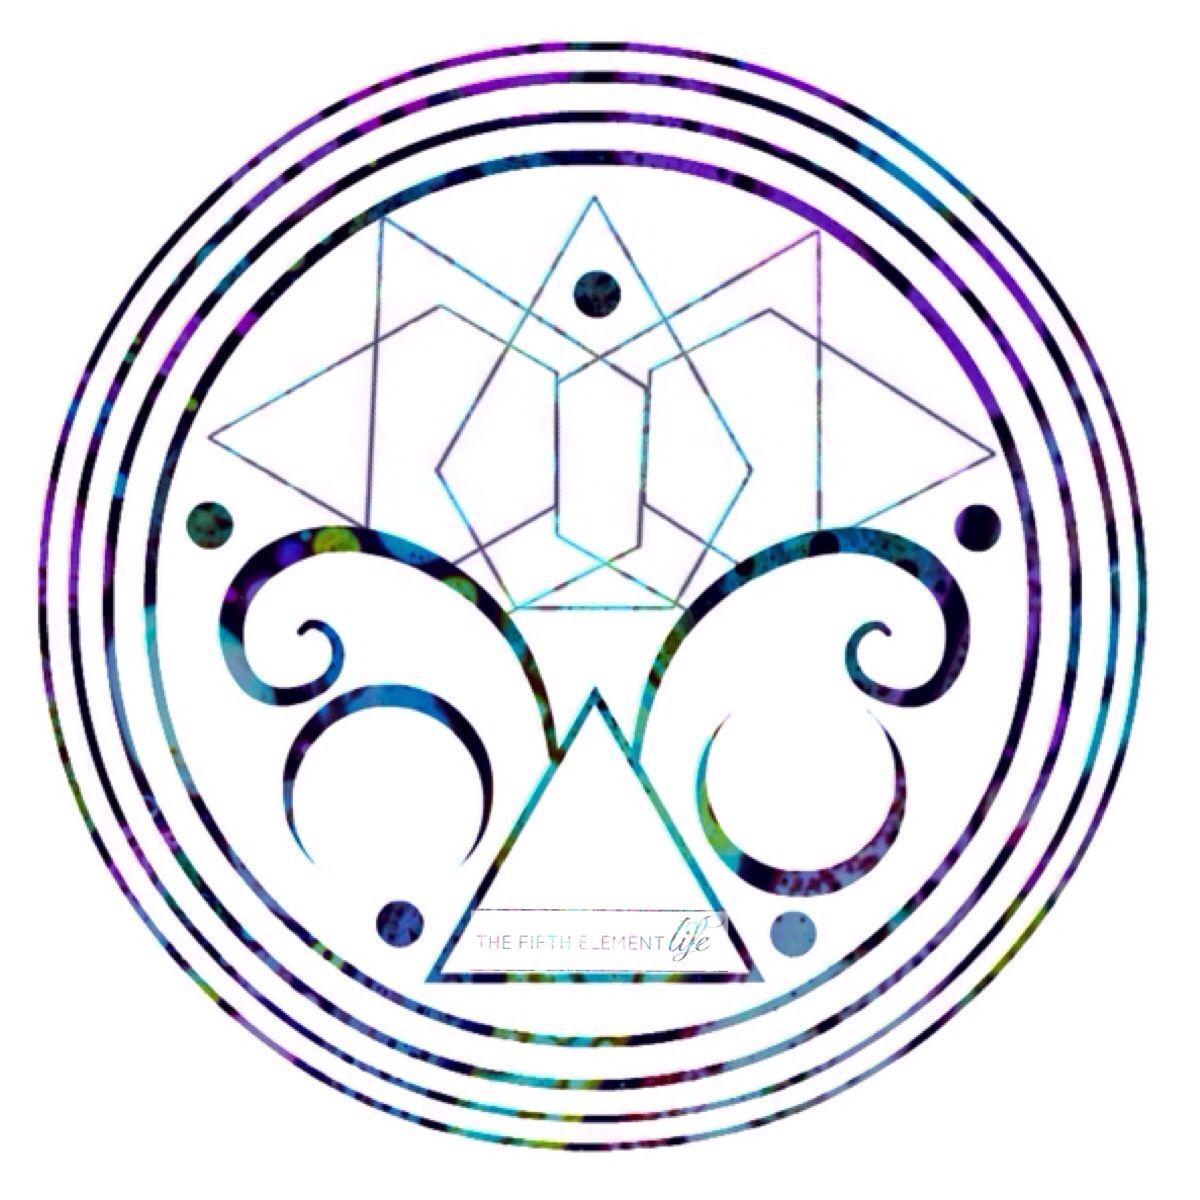 Intuition mandala symbol thefifthelementlife sacred intuition mandala symbol thefifthelementlife sacred geometry 3 biocorpaavc